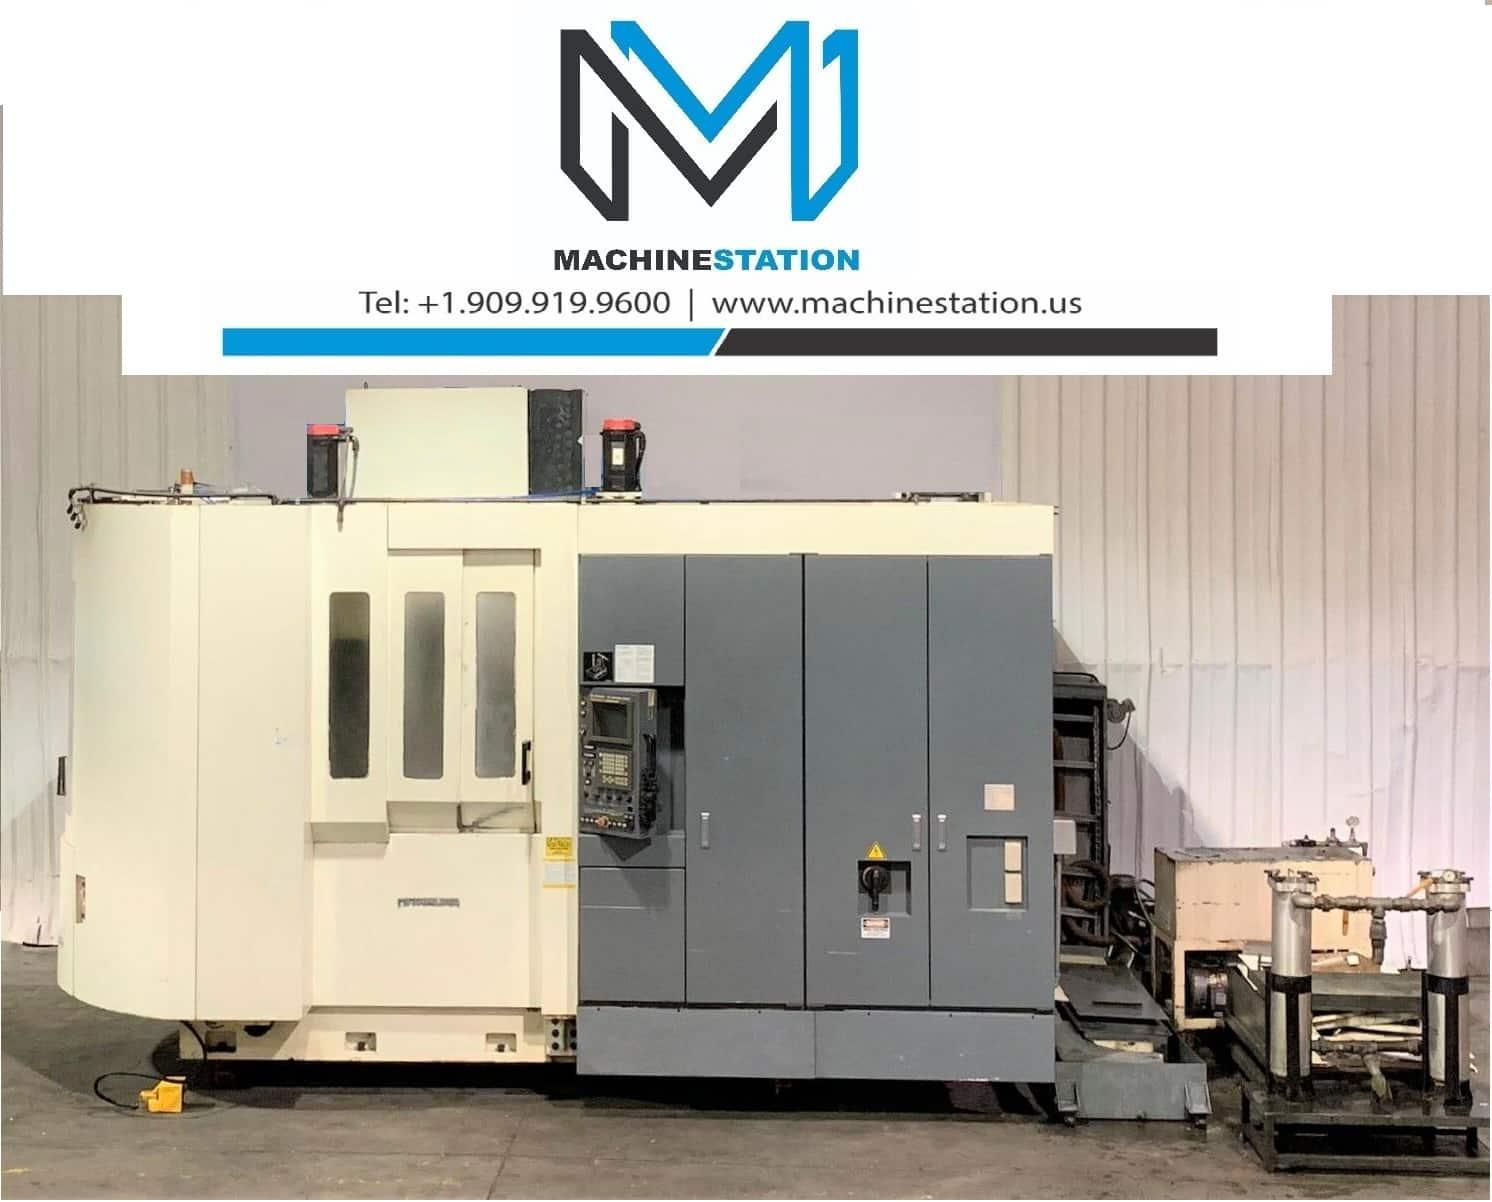 Used Kitamura HX-500i Horizontal Machining Center for Sale in California